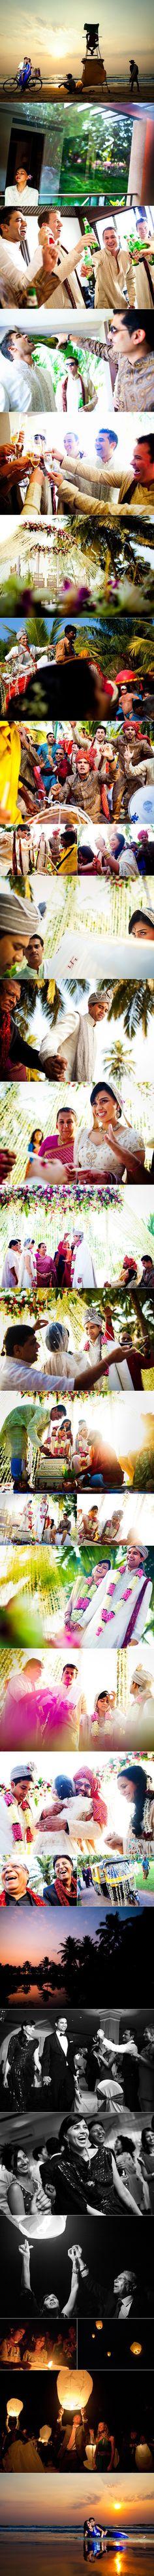 Indian Wedding Directory of Photographers, Planners, Caterers & Venues Asian Wedding Venues, Wedding Photos, Goa, Lanterns, Destination Wedding, Creativity, Indian, Marriage Pictures, Destination Weddings